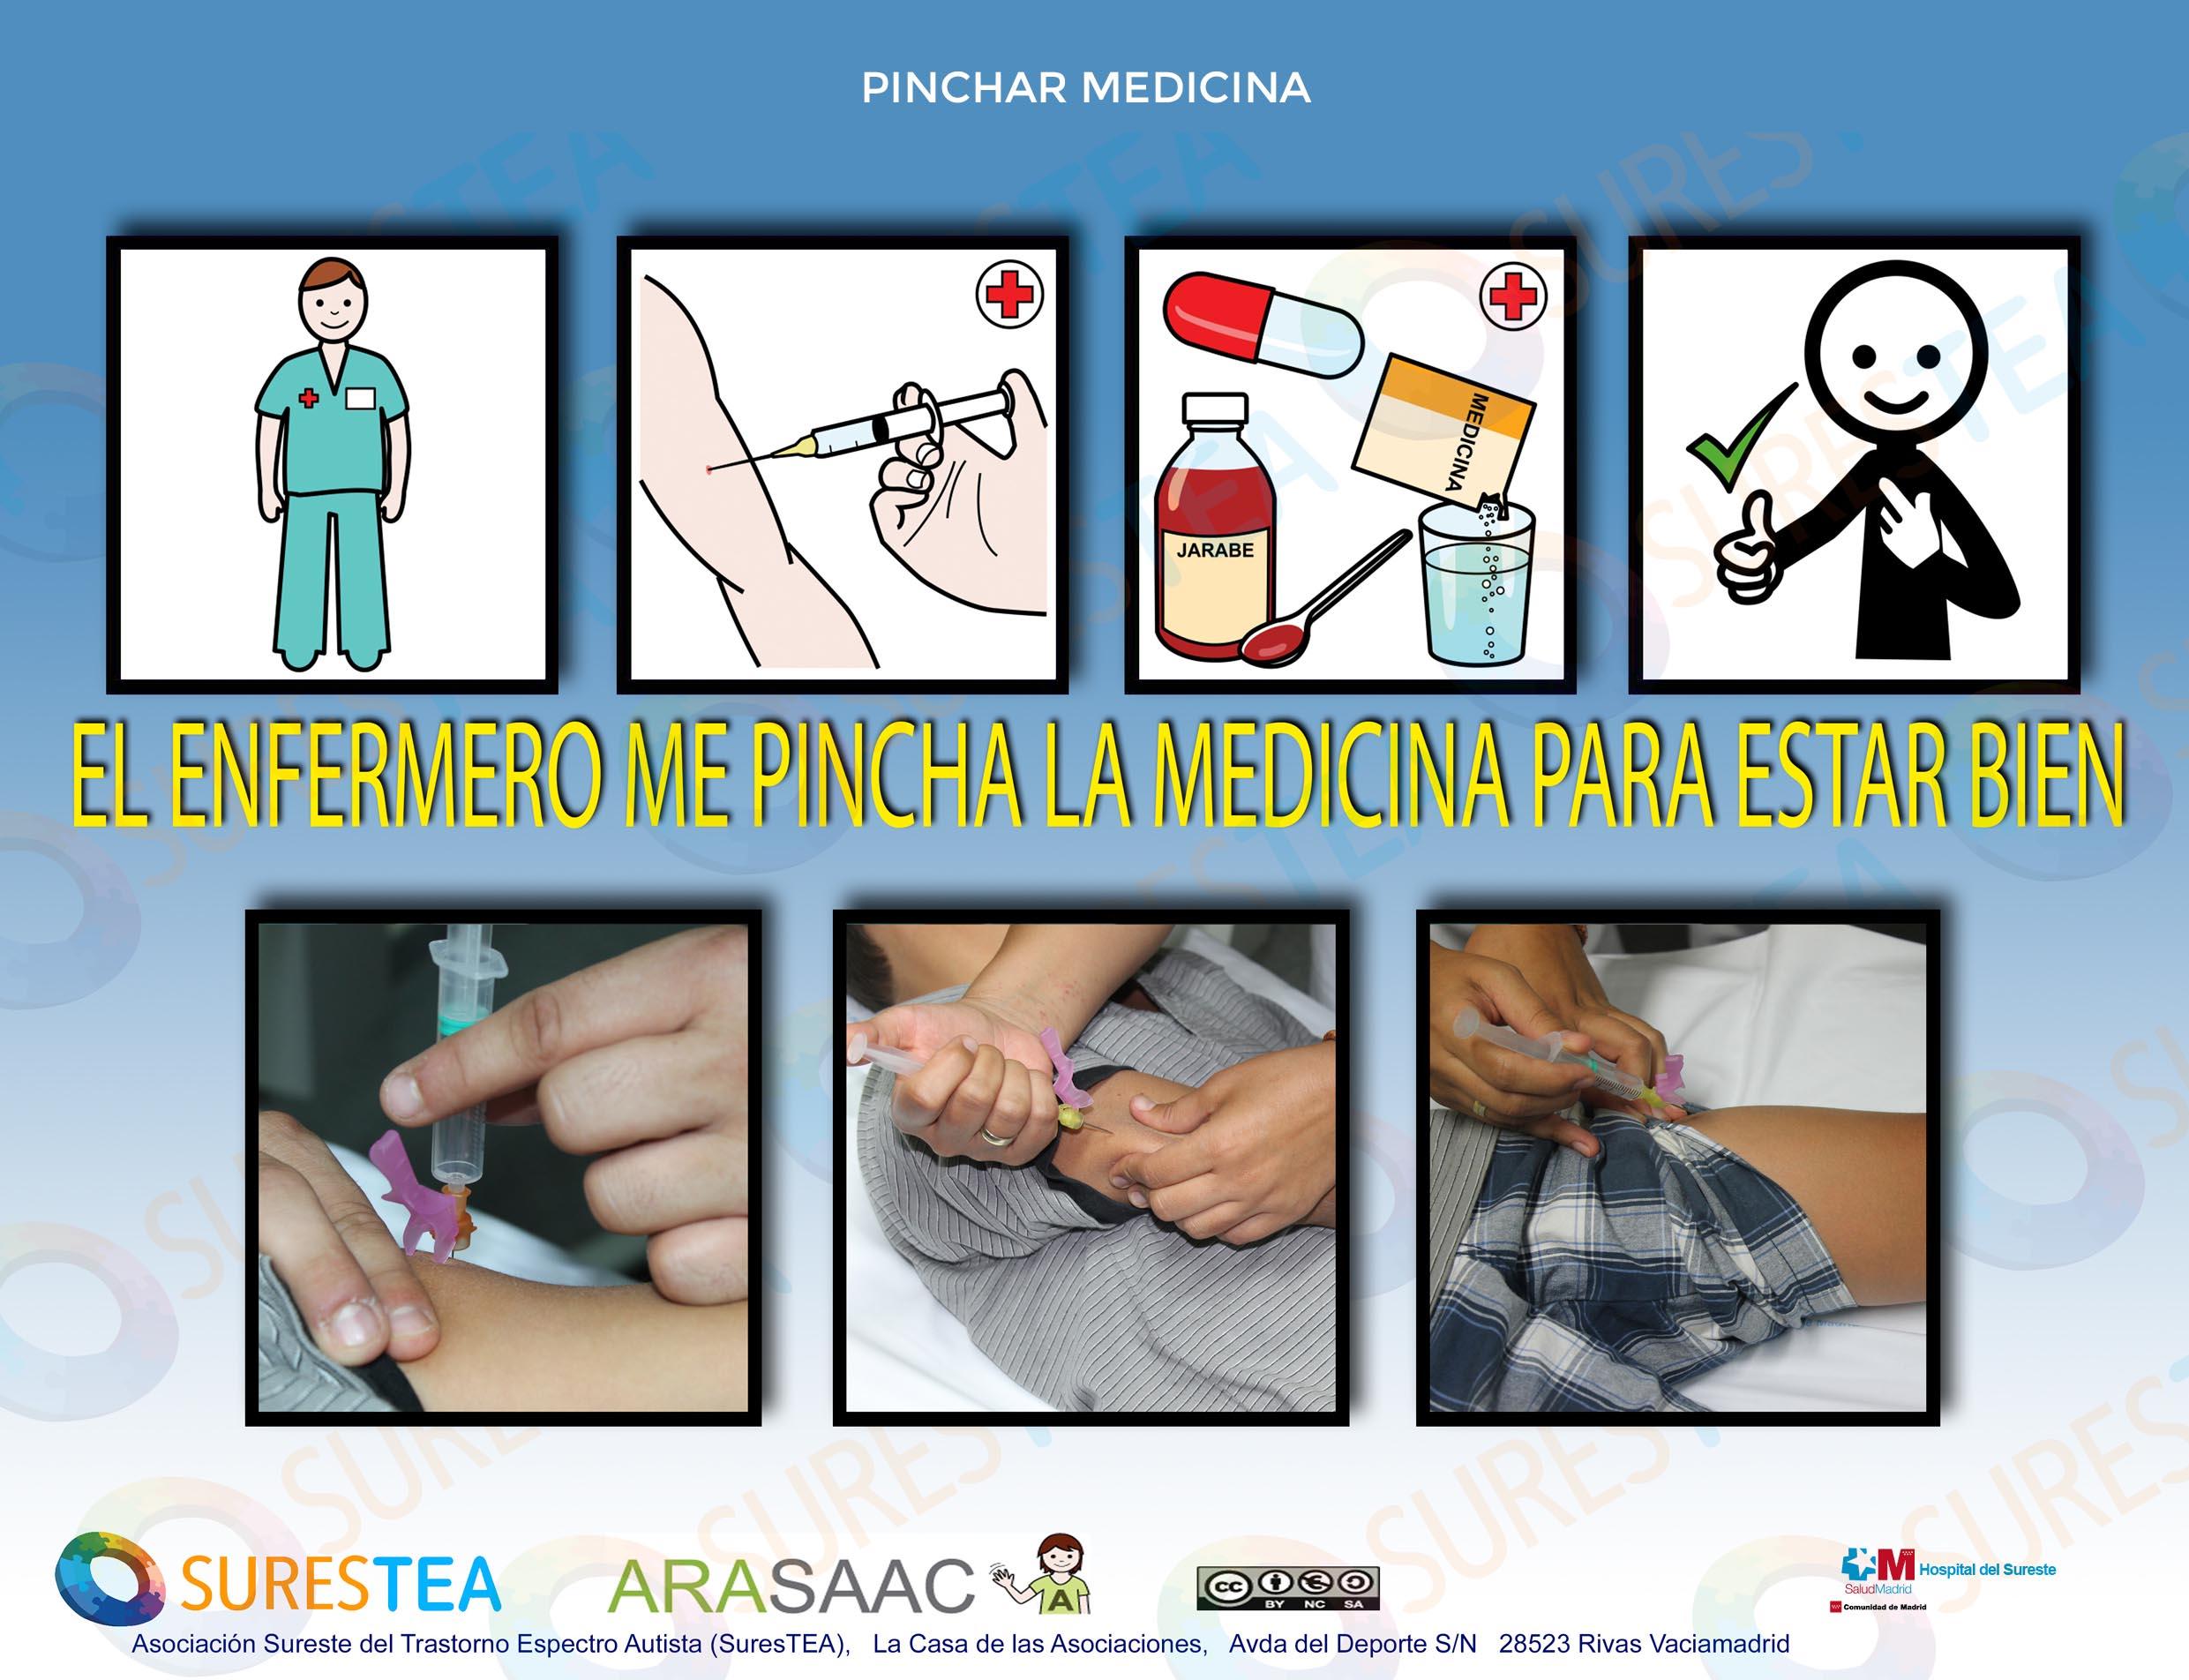 Pinchar-medicina